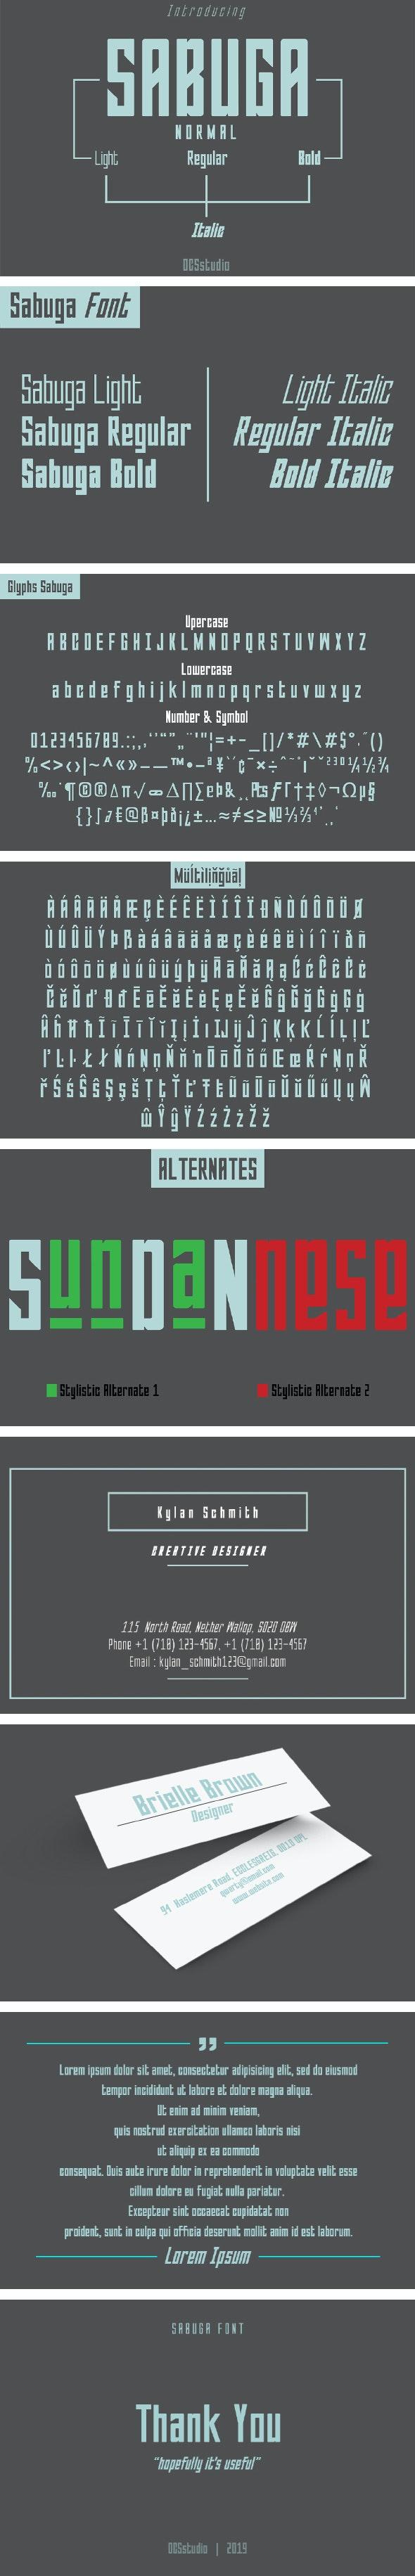 Sabuga Font - Condensed Sans-Serif